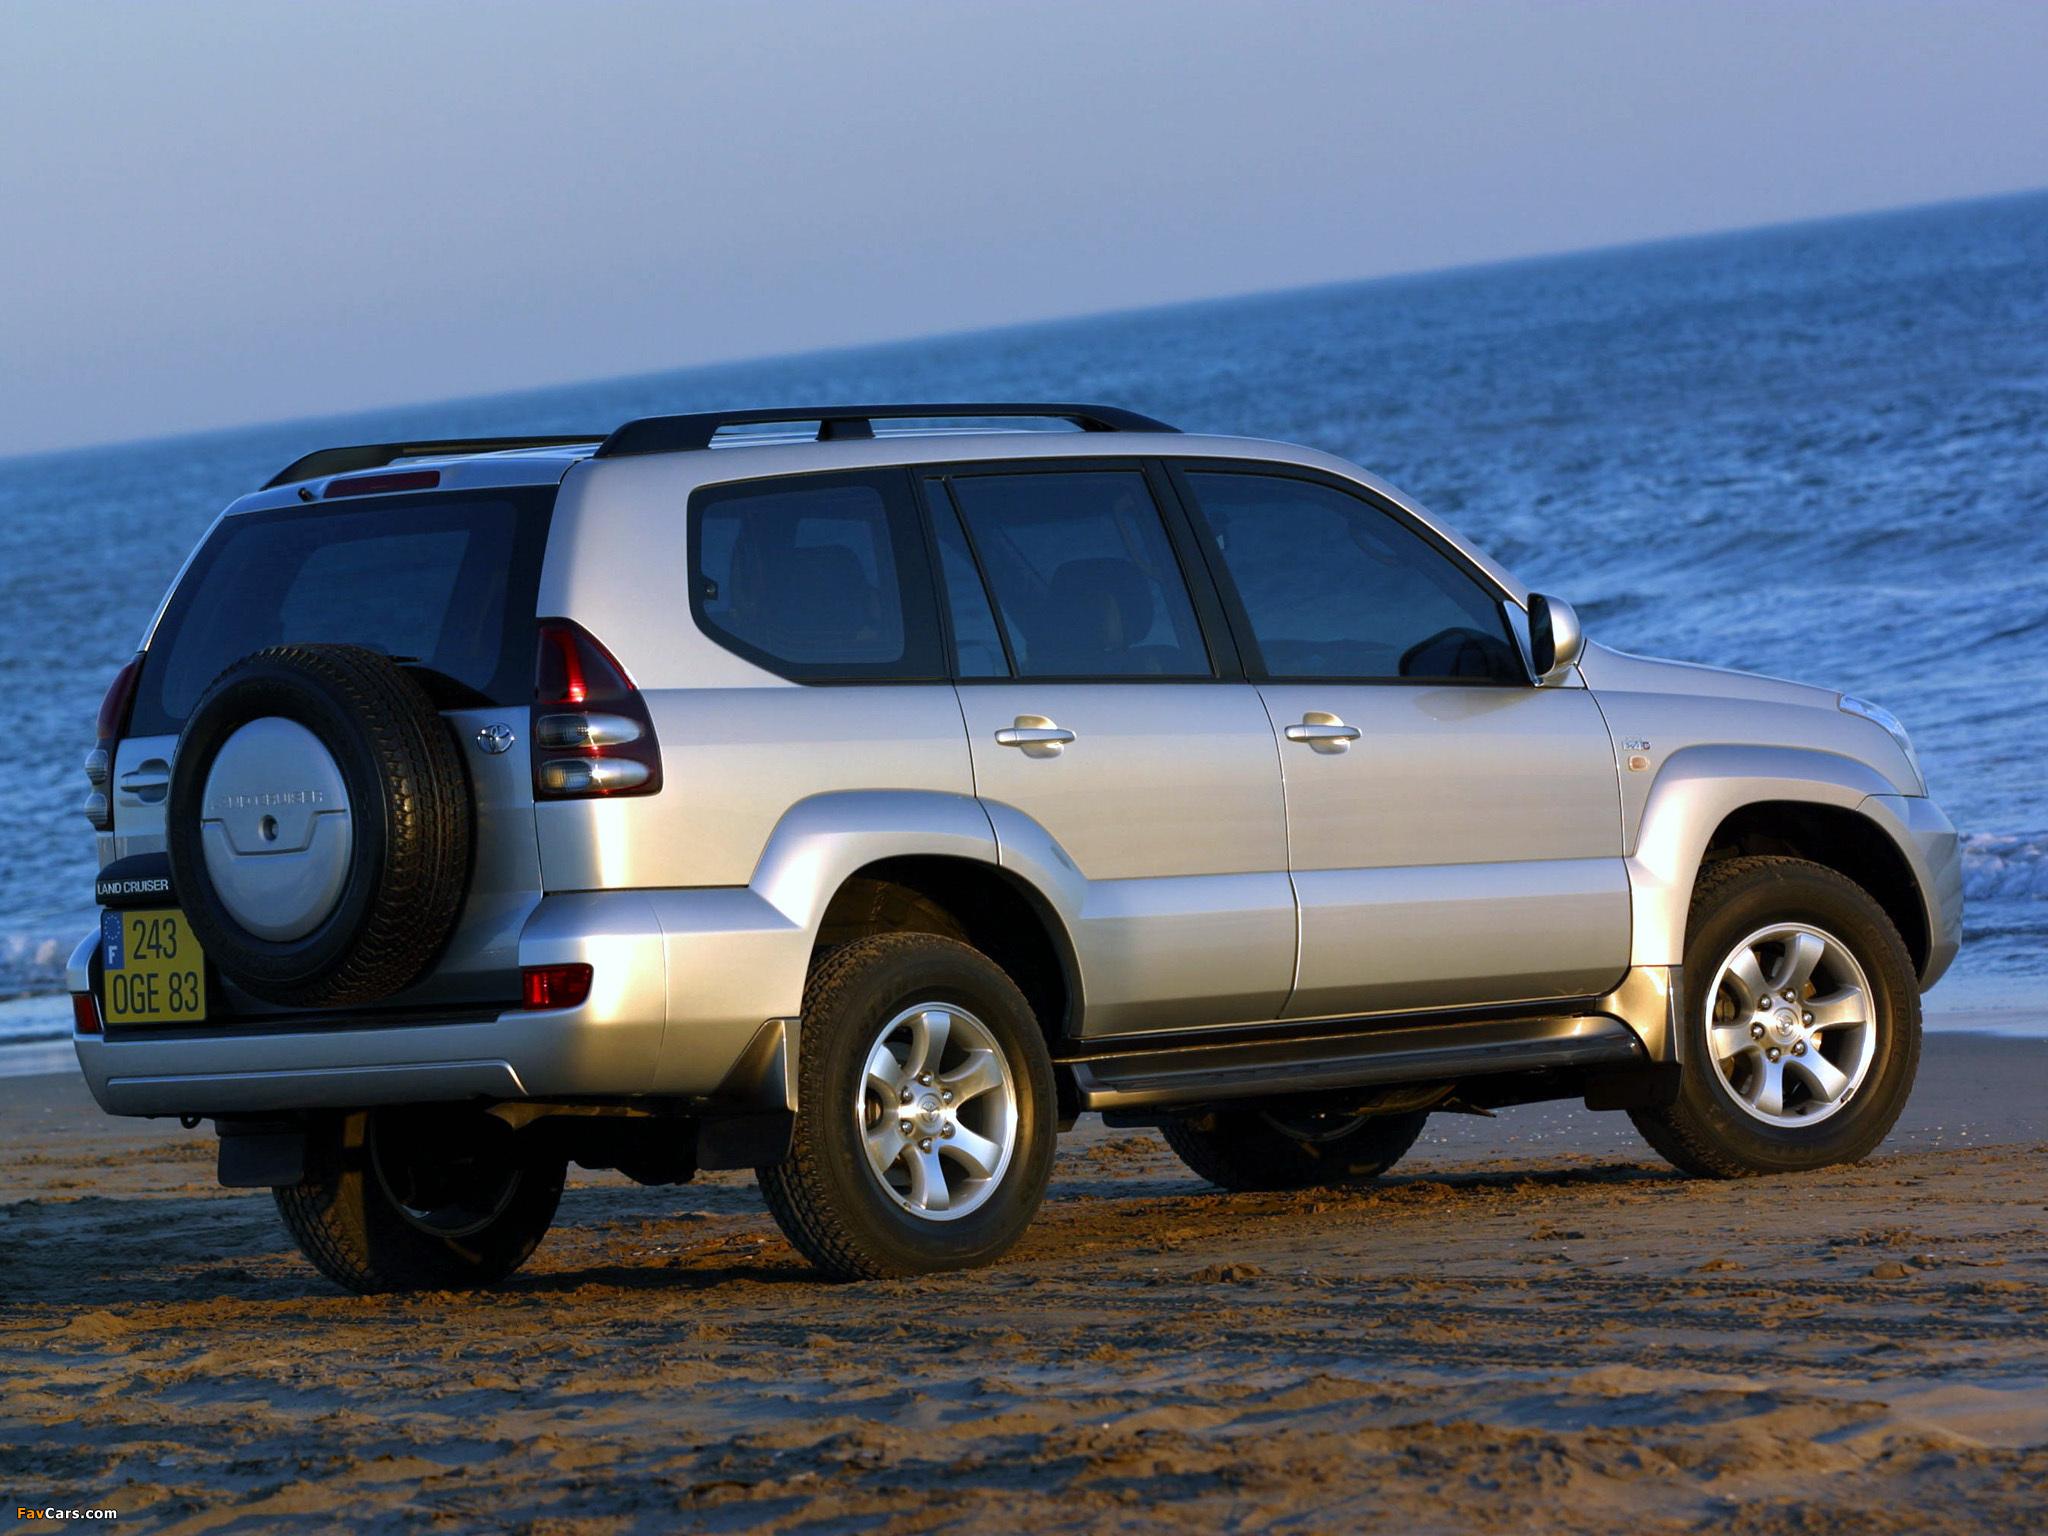 Toyota Land Cruiser Prado 2 7 технические характеристики #11